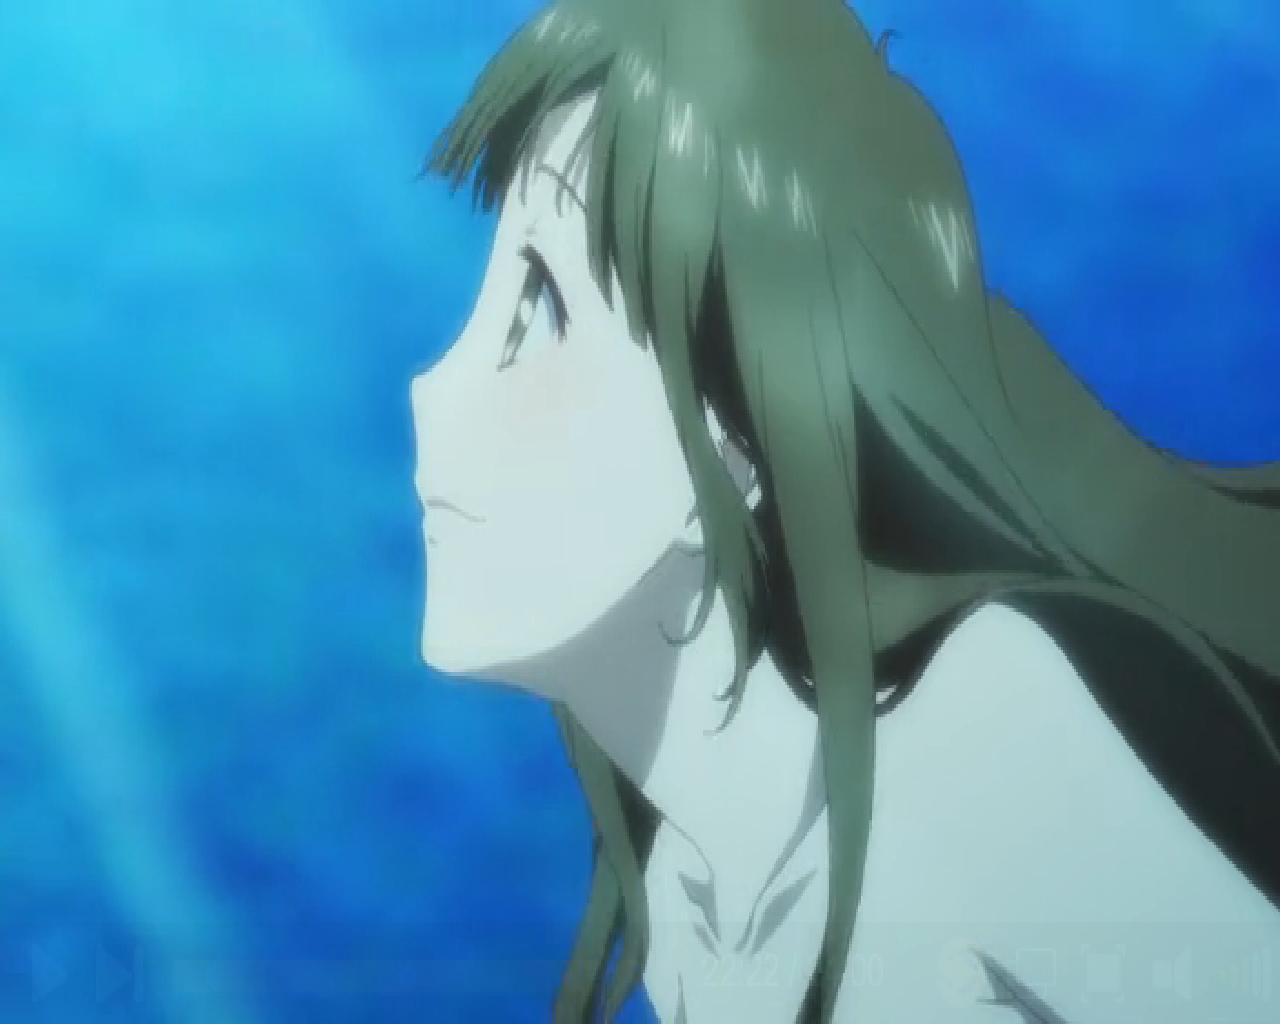 Yandere - Anime and Game Obsessed.: Hanasaku Iroha Episode